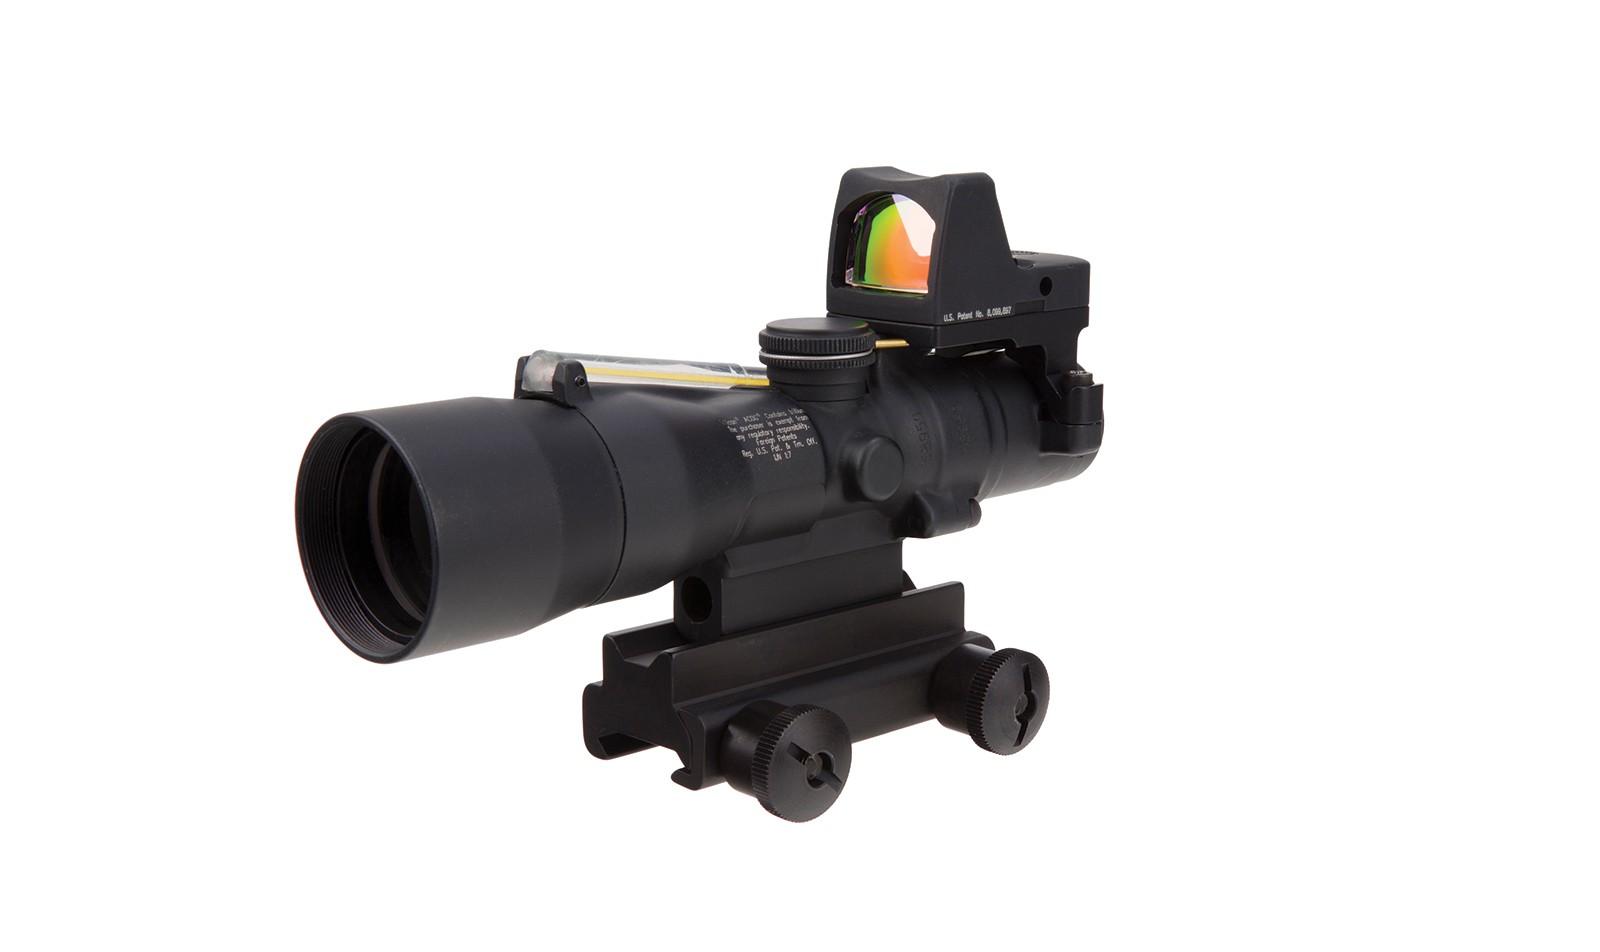 Trijicon ACOG® 3x30 BAC Riflescope  and Trijicon RMR® - 5.56x45mm / 62gr